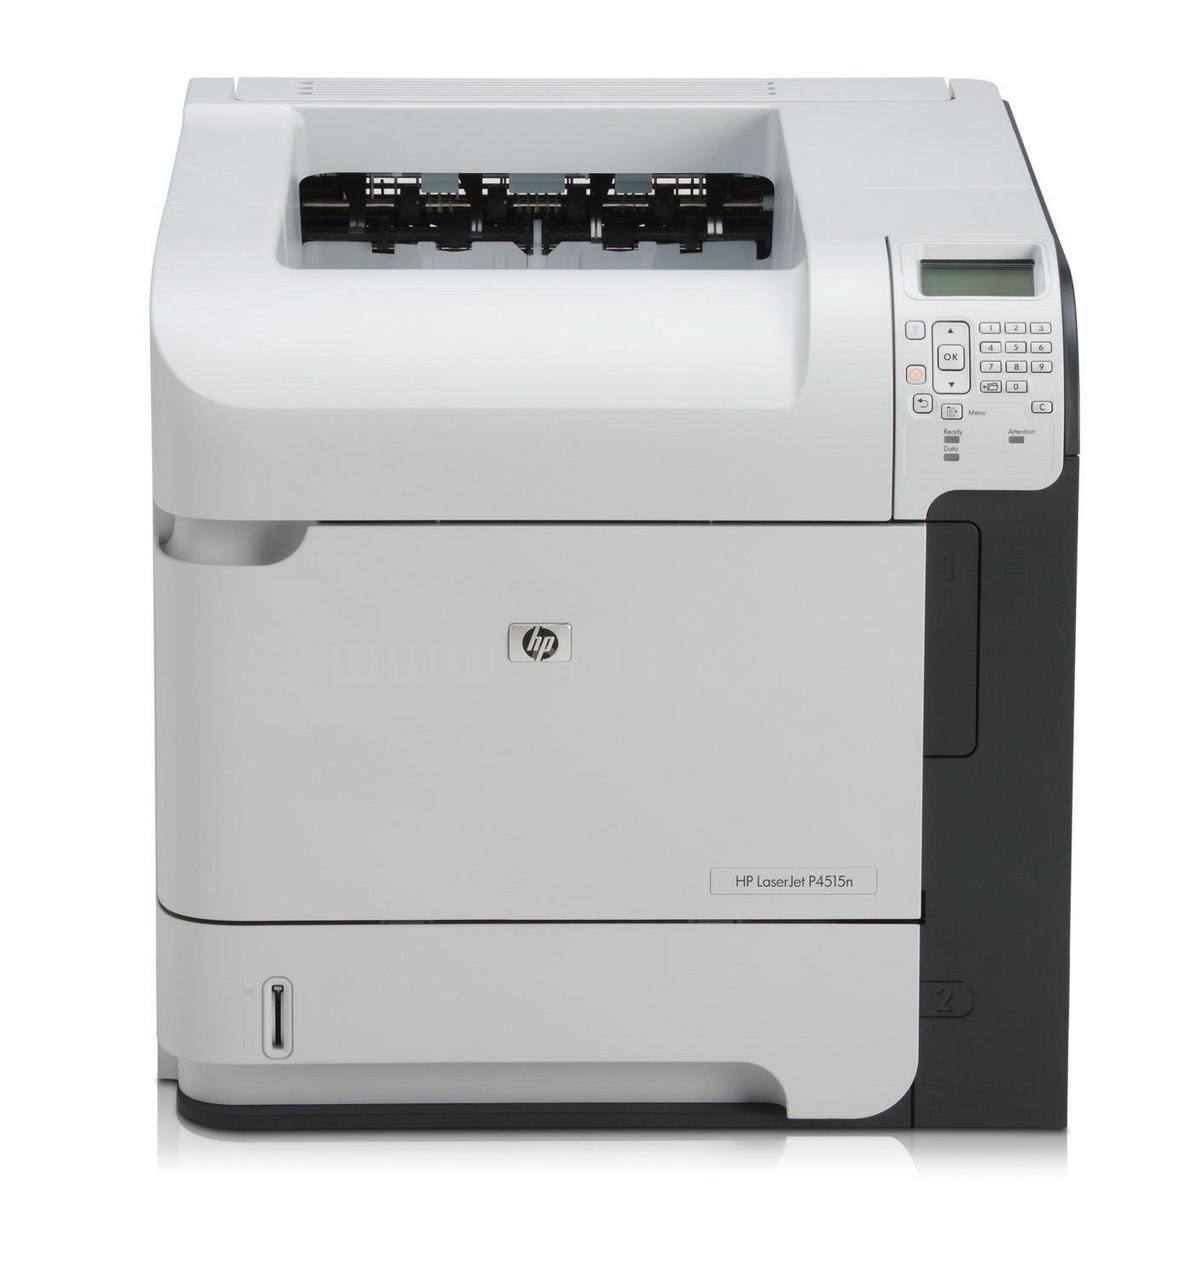 HP LaserJet P4515n - CB514A - HP Laser Printer for sale